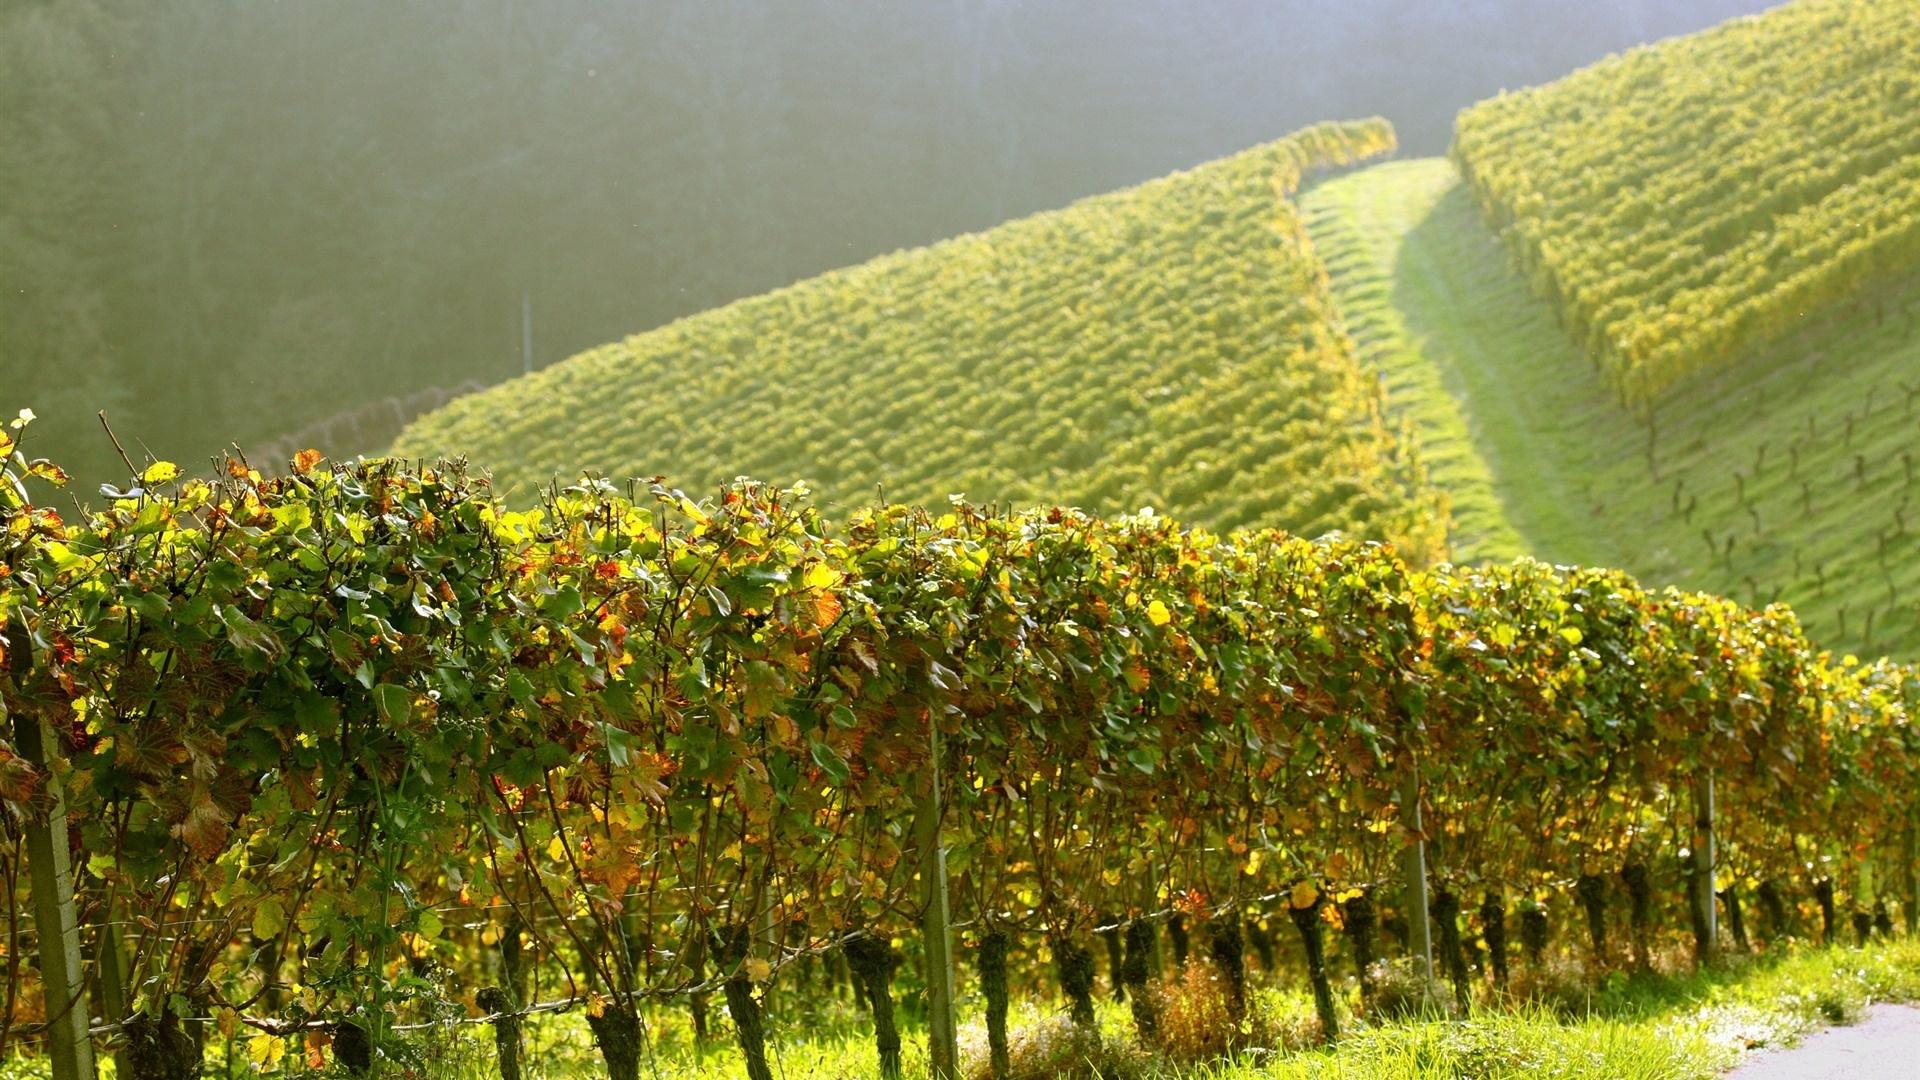 Vineyard free photo